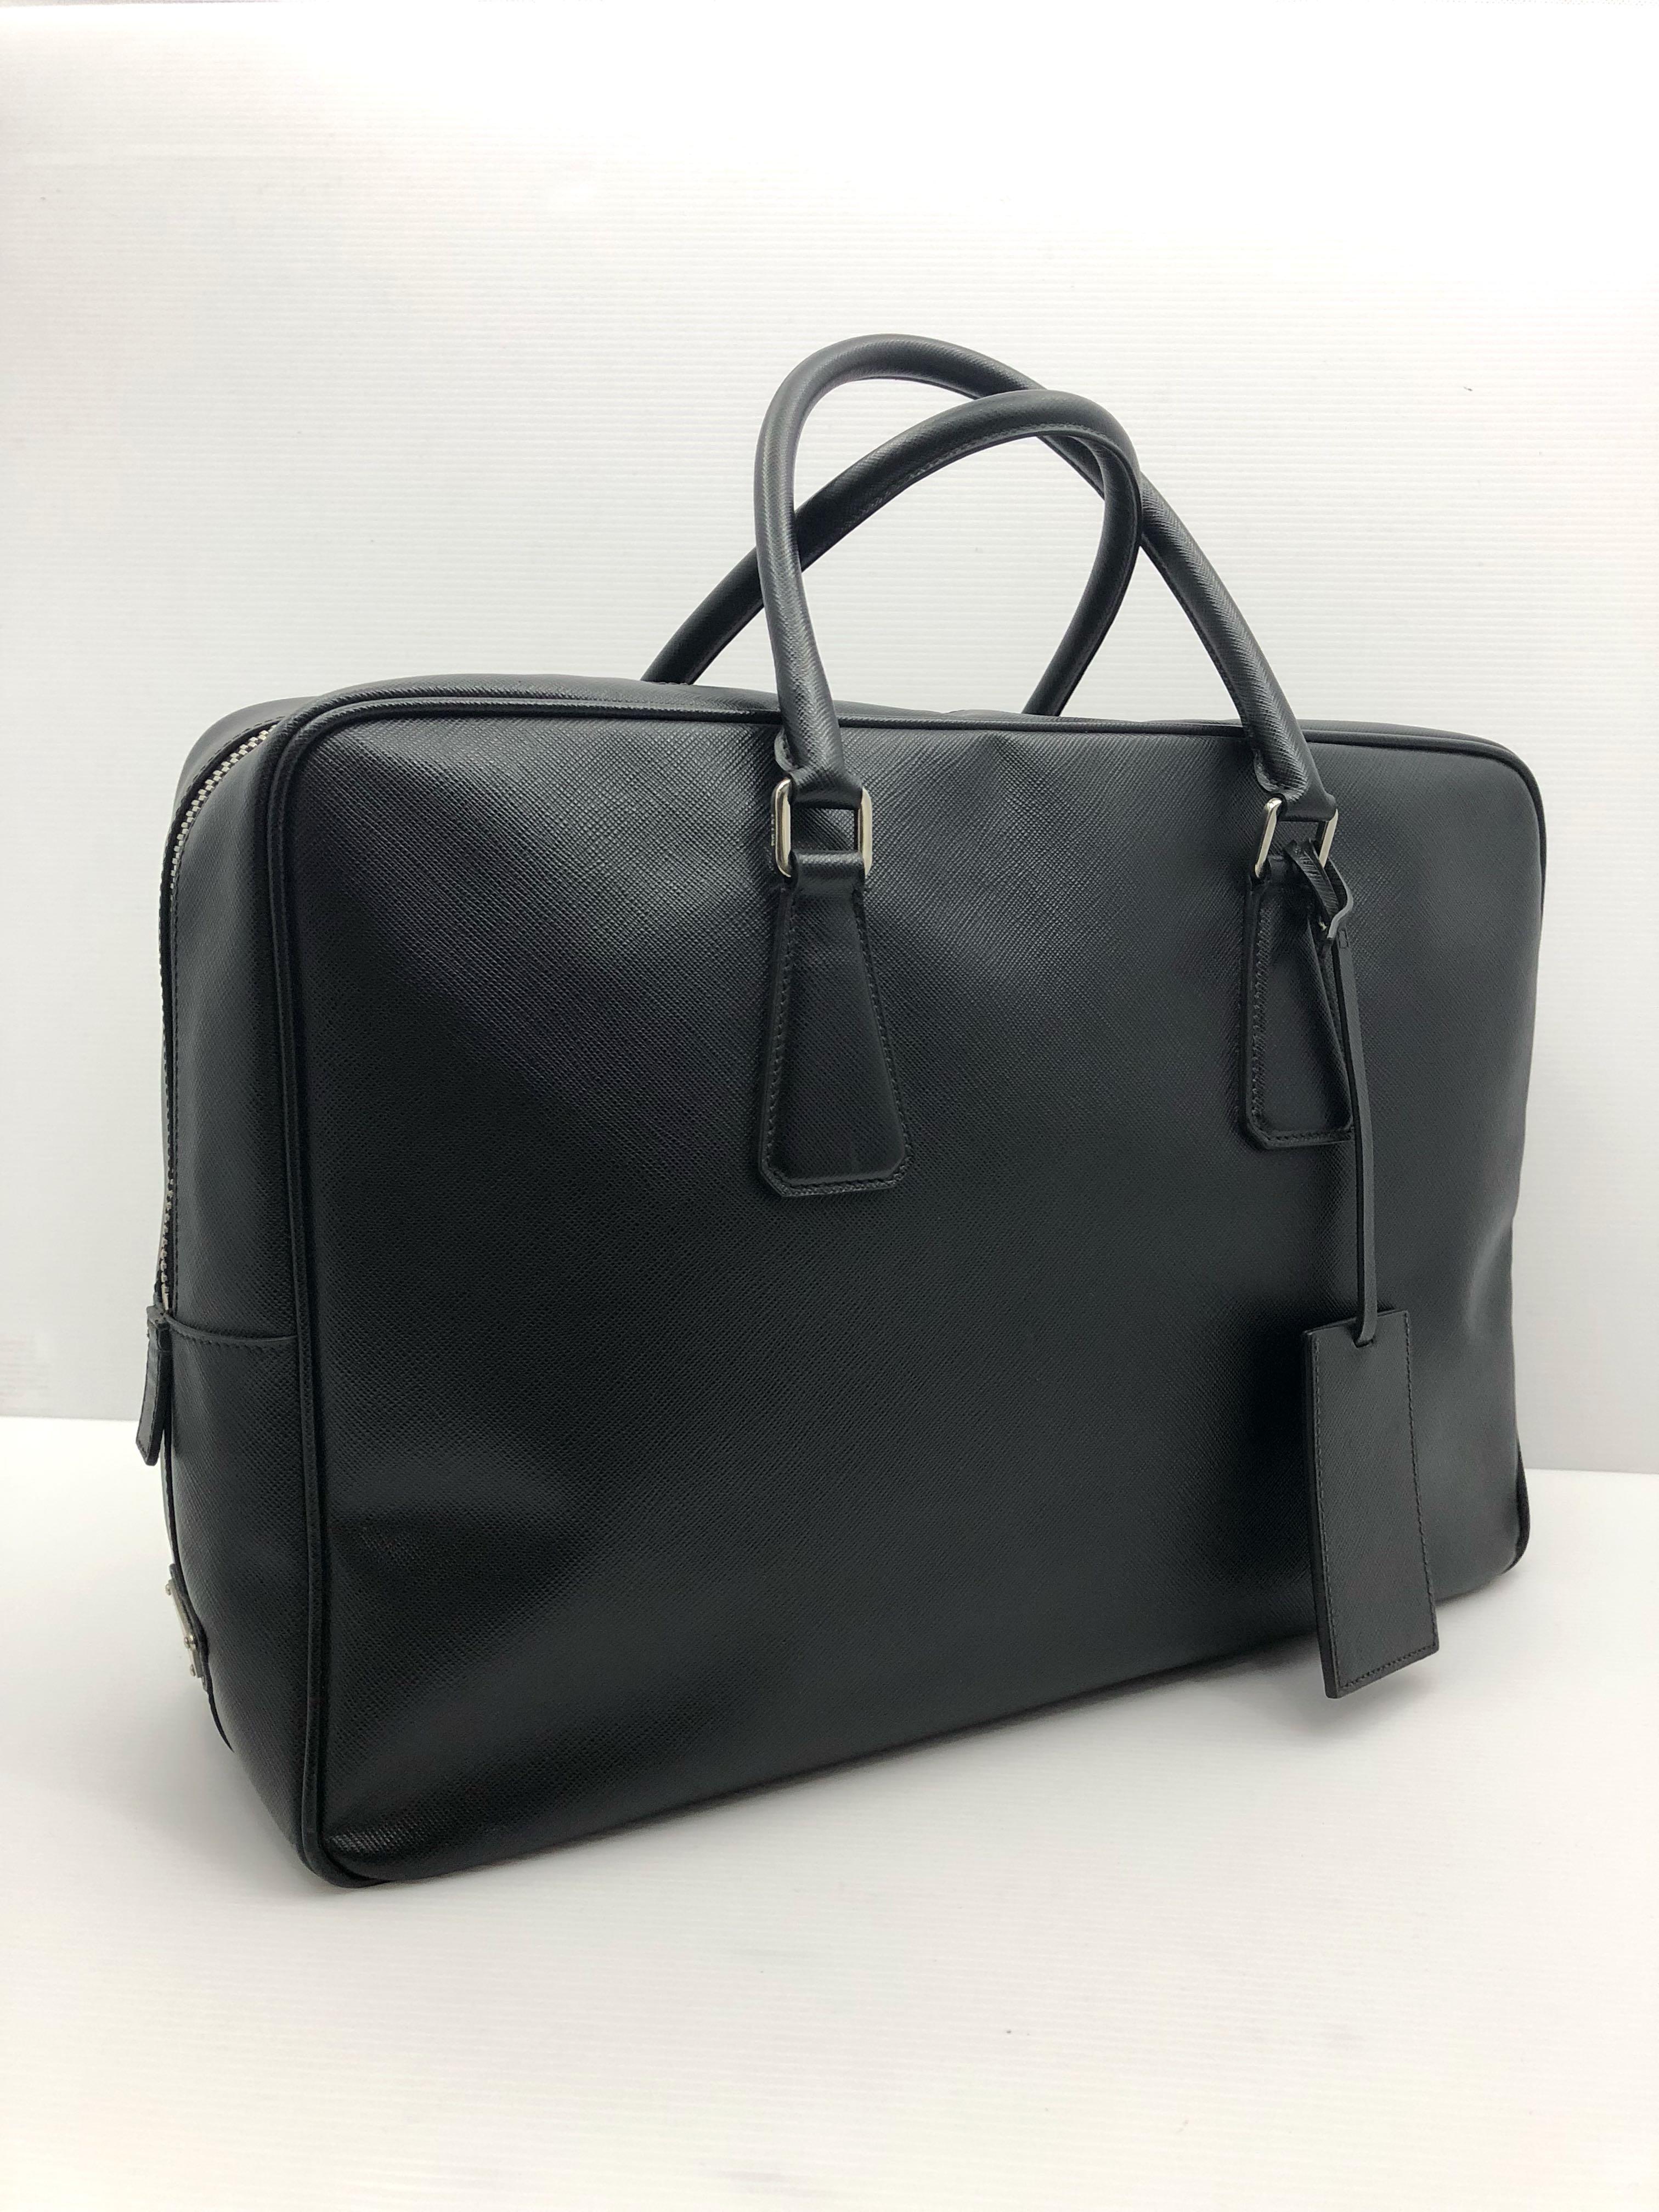 11547291b396 PRADA SAFFIANO LEATHER BUSINESS BAG 187003178, Men's Fashion, Bags ...